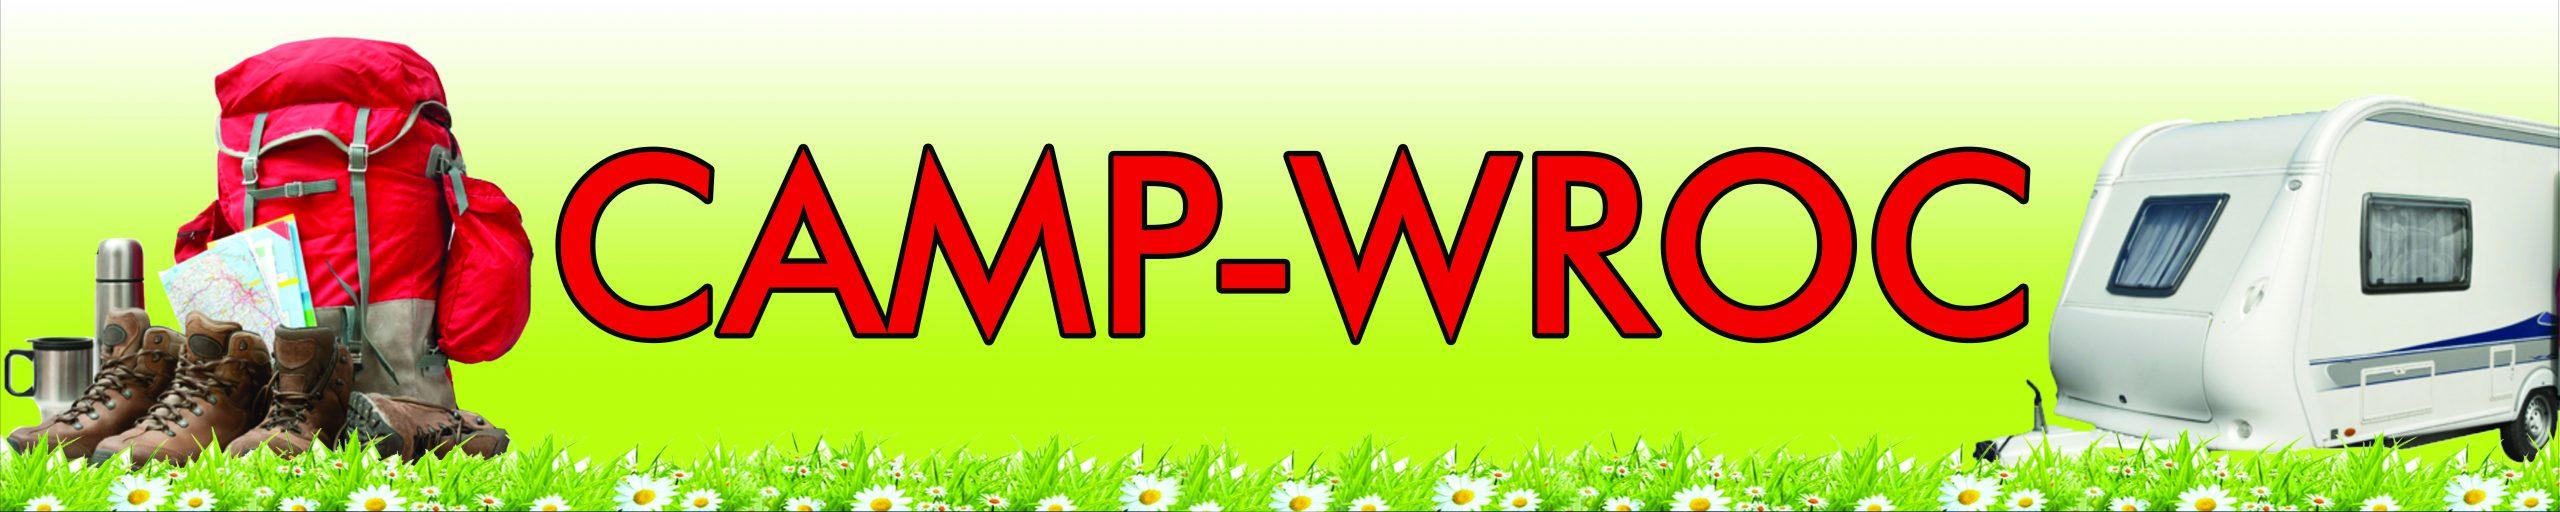 CAMP-WROC